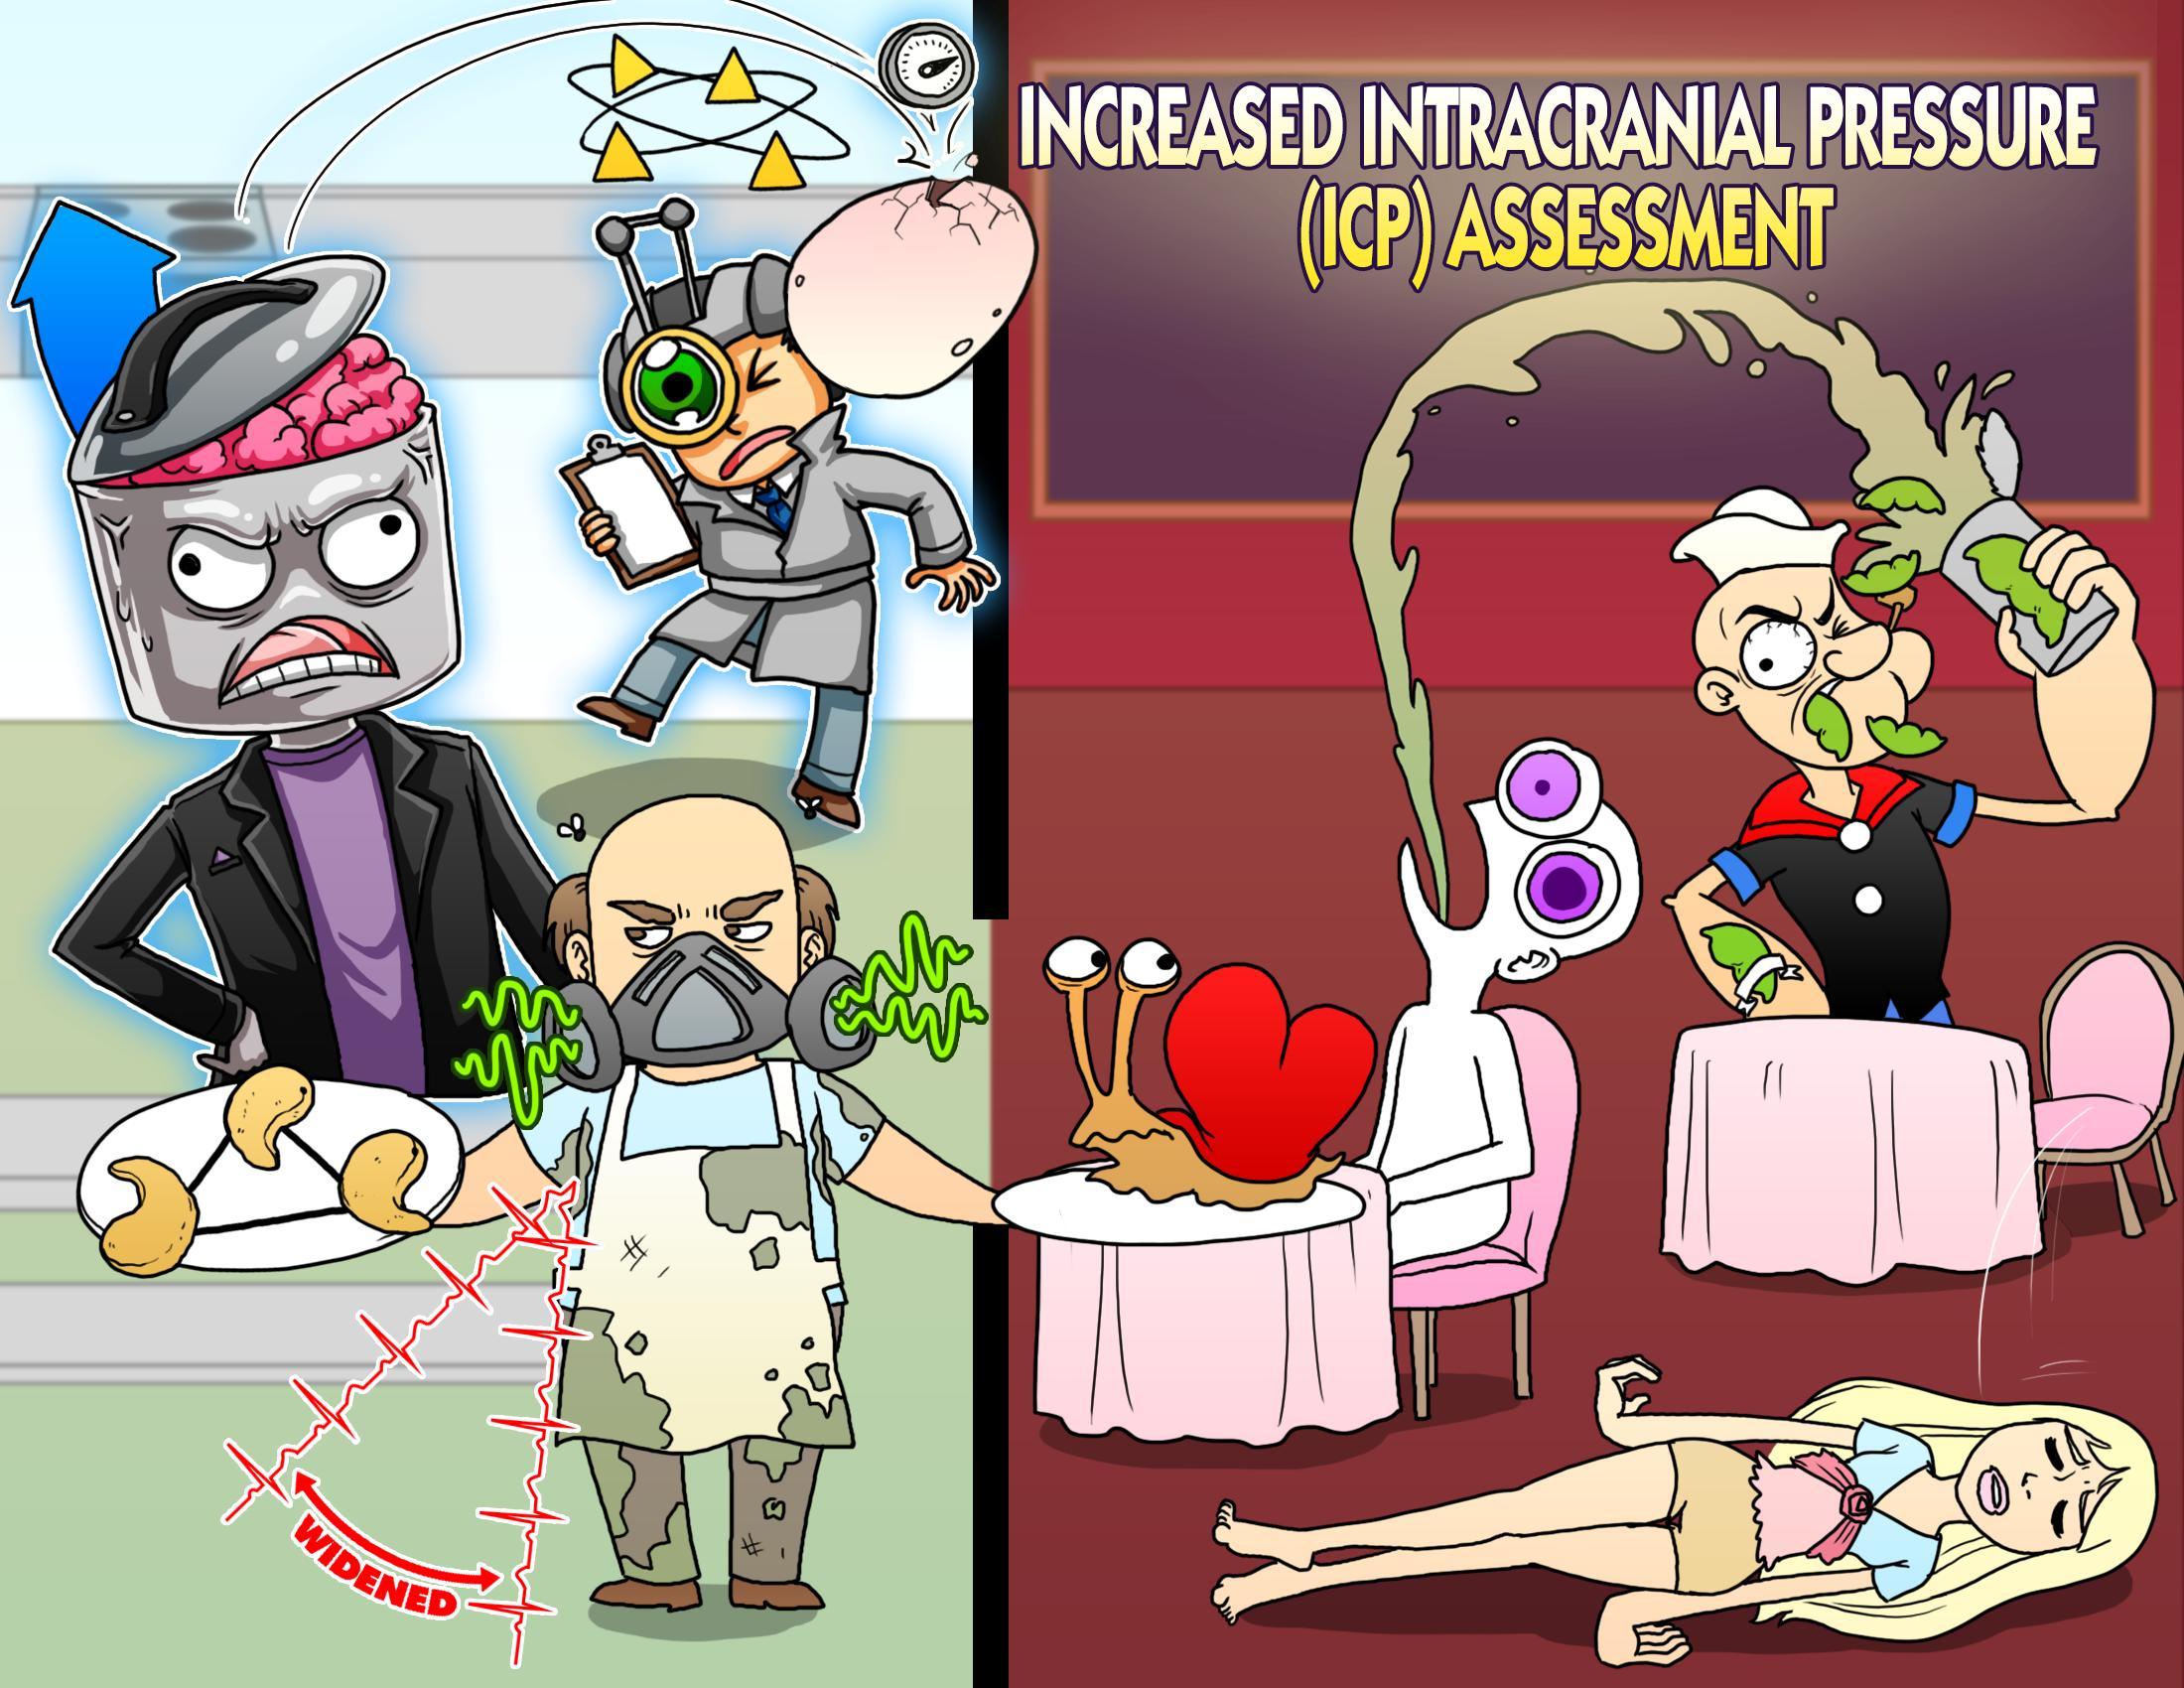 Increased Intracranial Pressure (ICP) Assessment